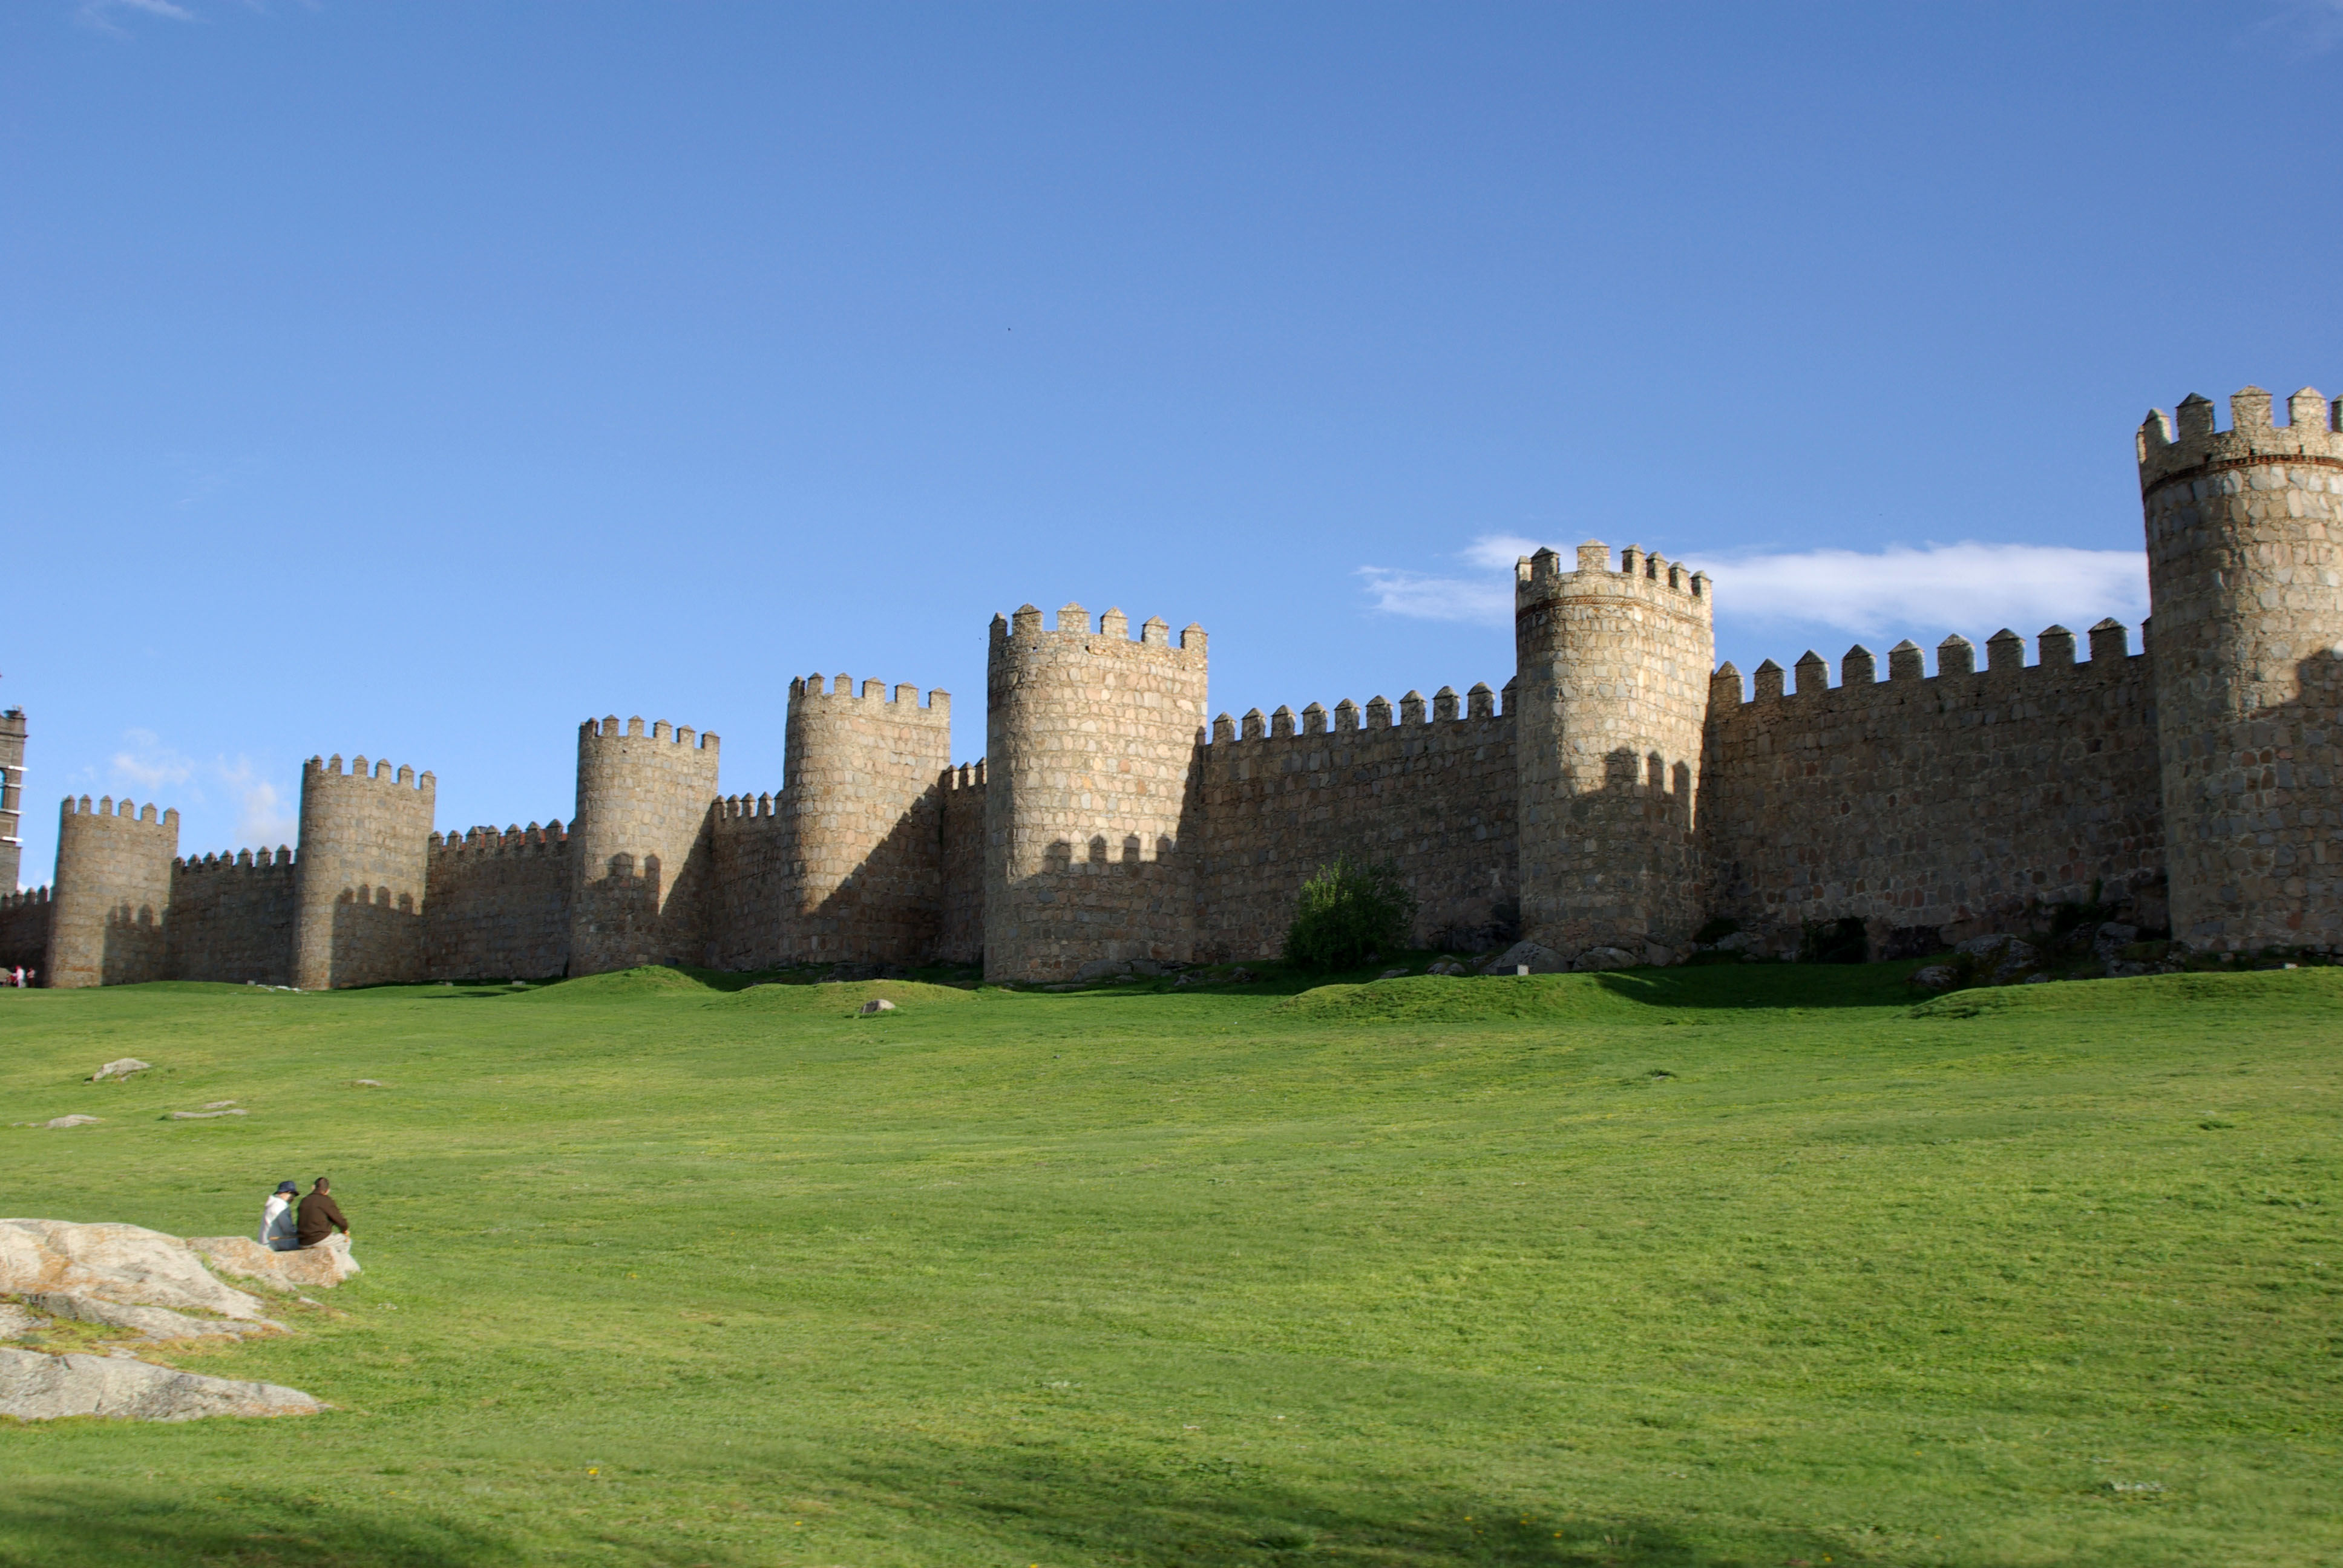 File:Avila muralla 01 by-dpc.jpg - Wikimedia Commons